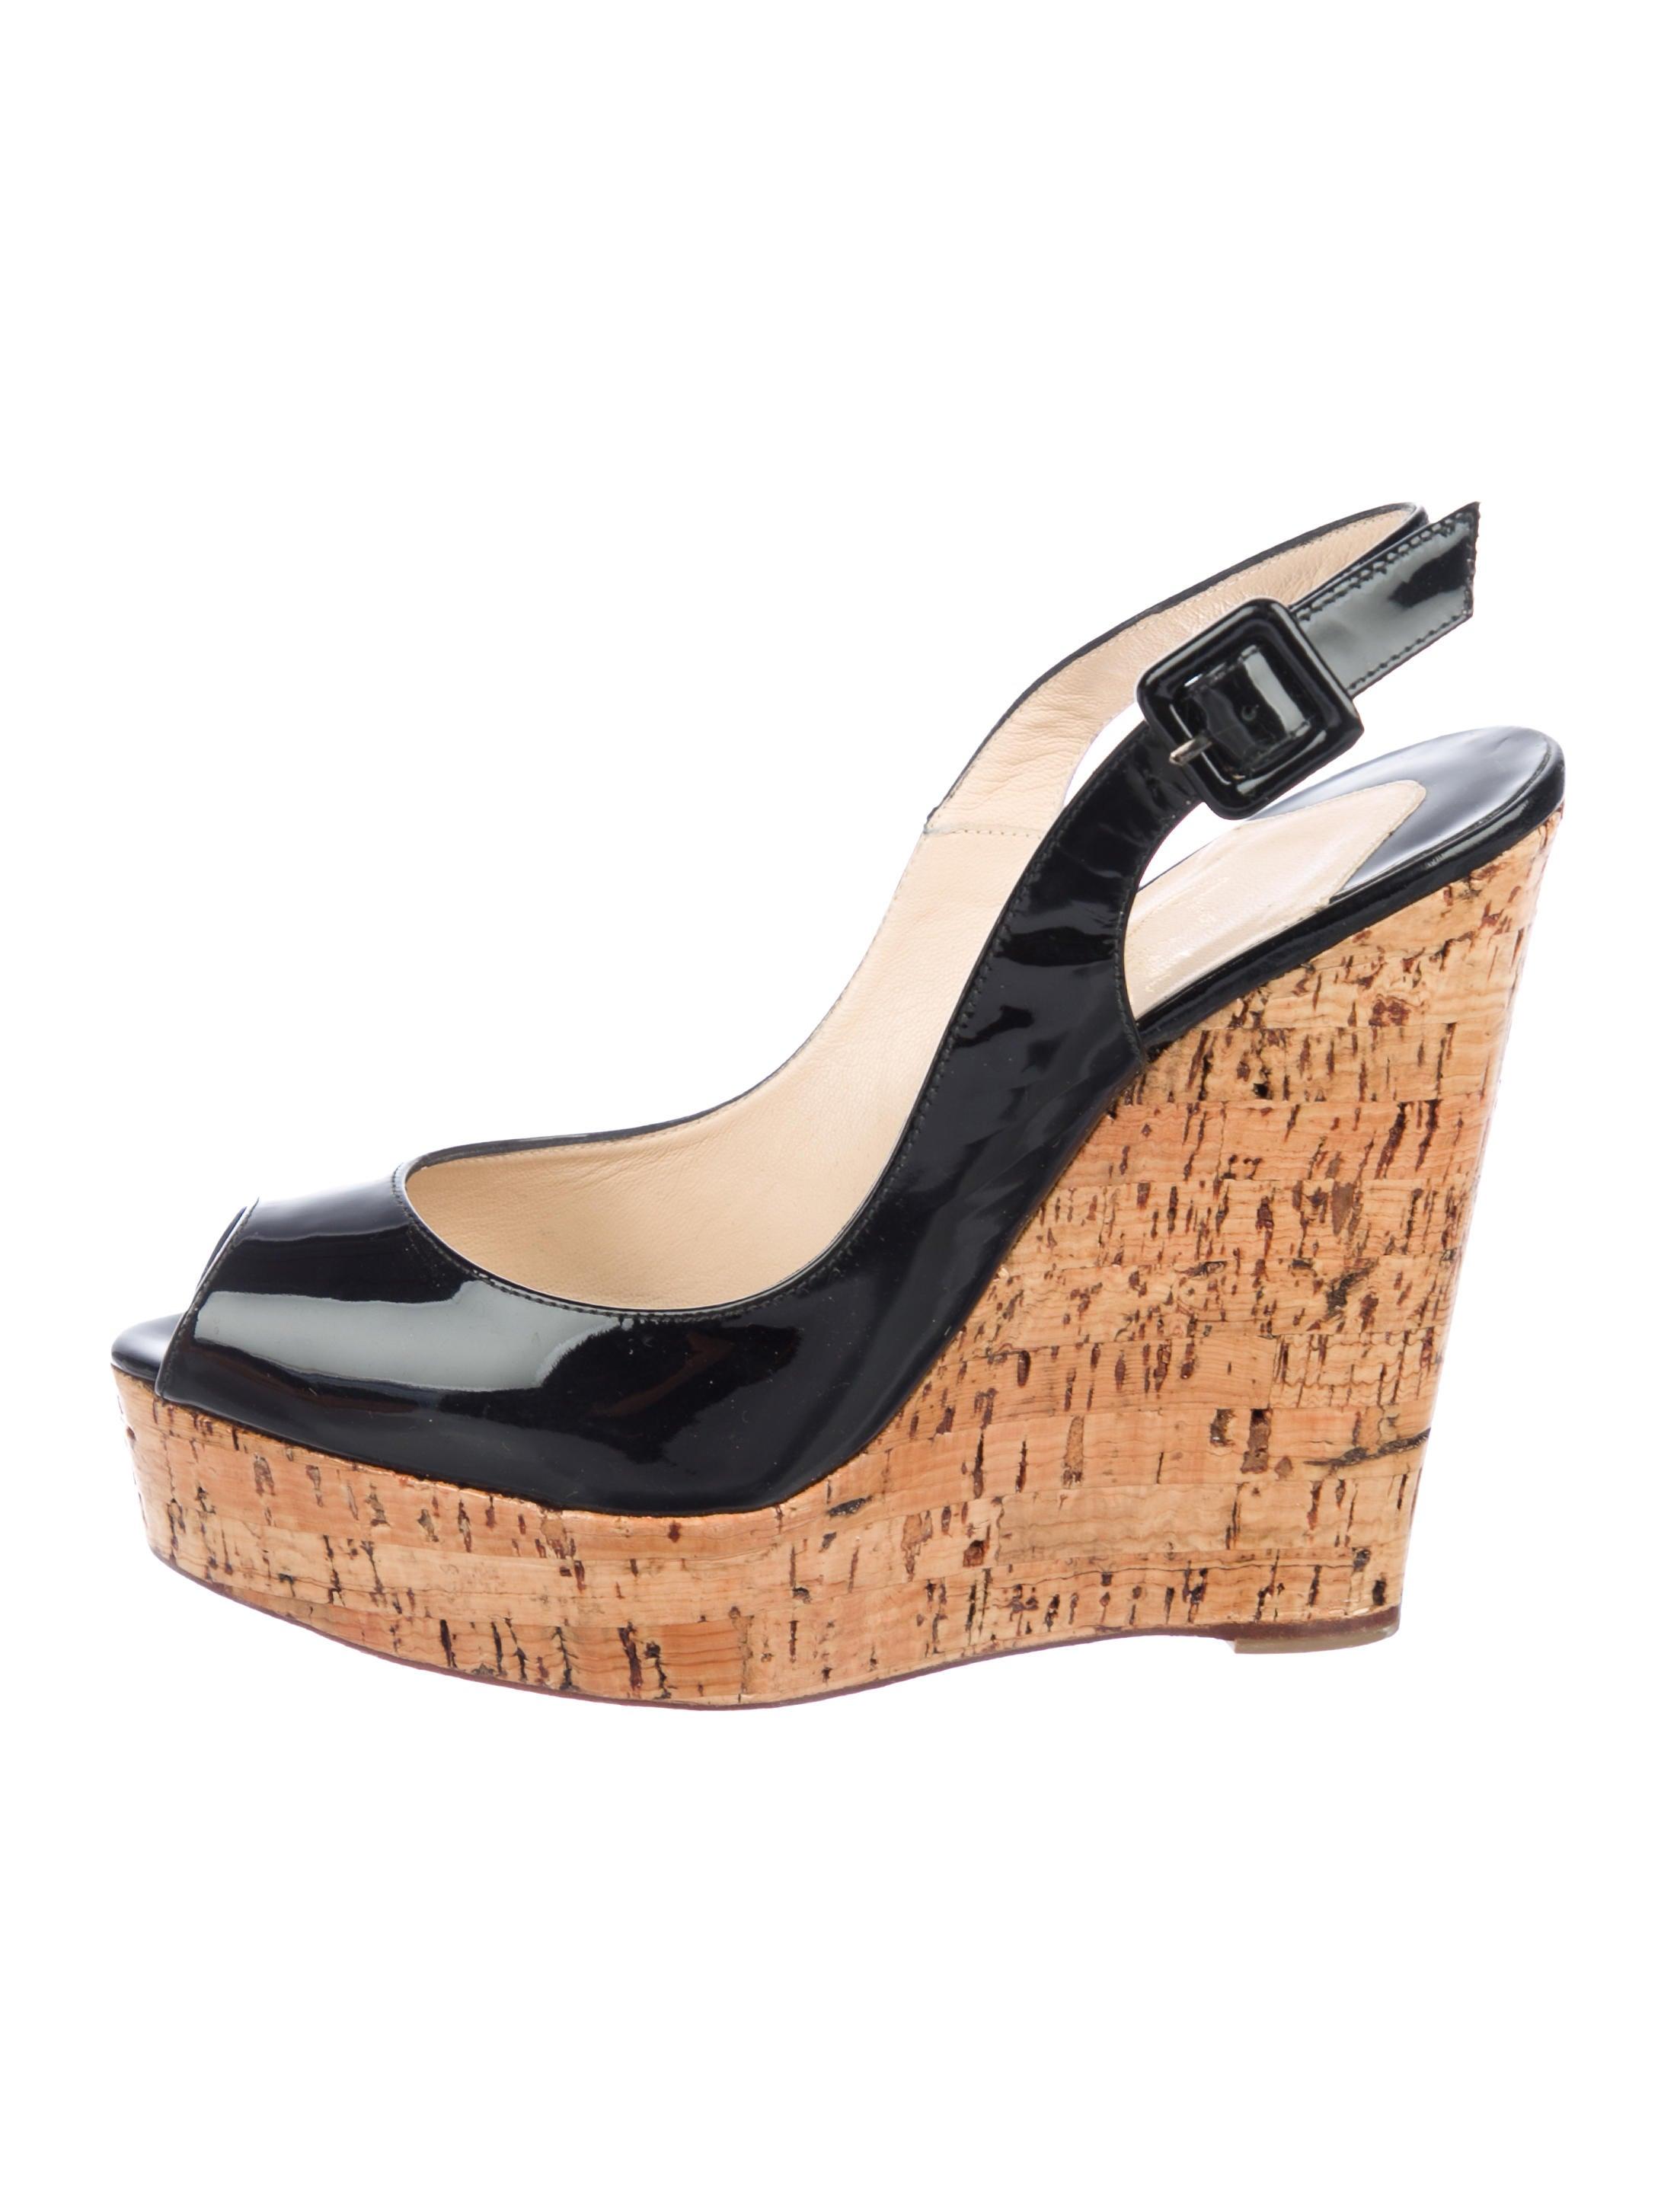 cc1b40e63e2 Christian Louboutin Menorca Espadrille Wedges - Shoes - CHT137482 ...